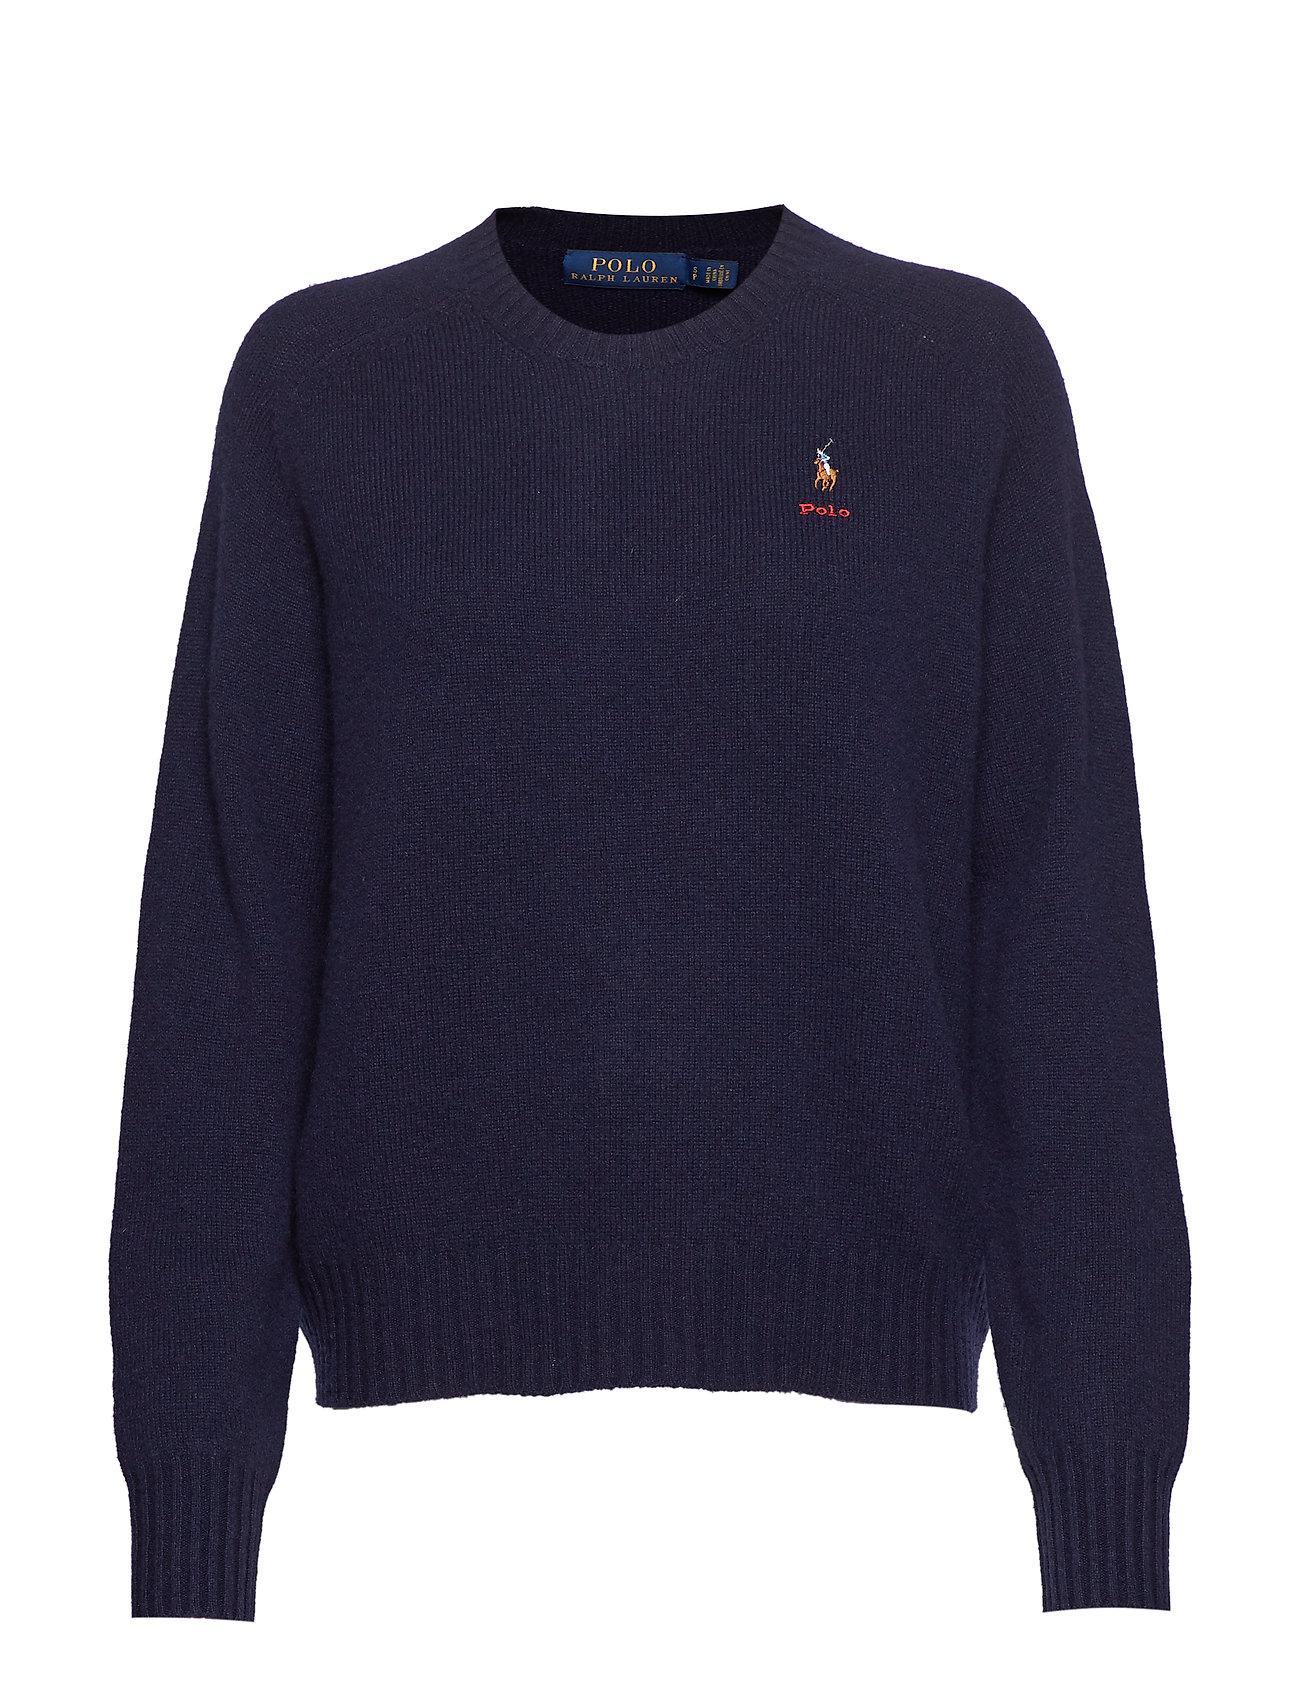 Polo Ralph Lauren Wool Crewneck Sweater - HUNTER NAVY